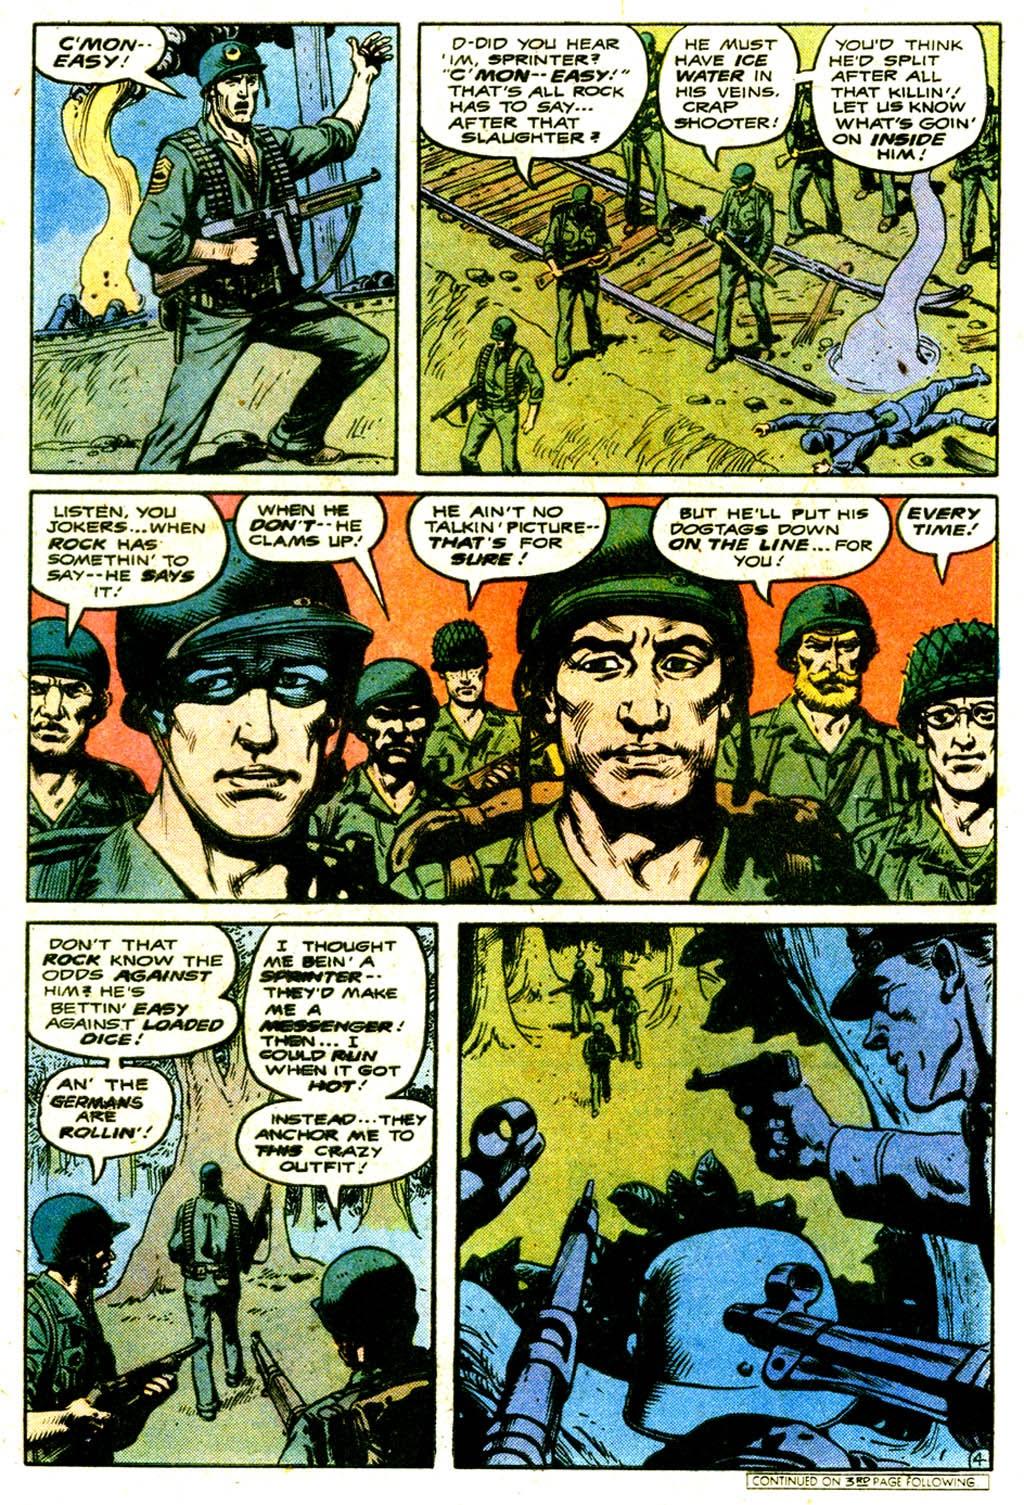 Read online Sgt. Rock comic -  Issue #316 - 6